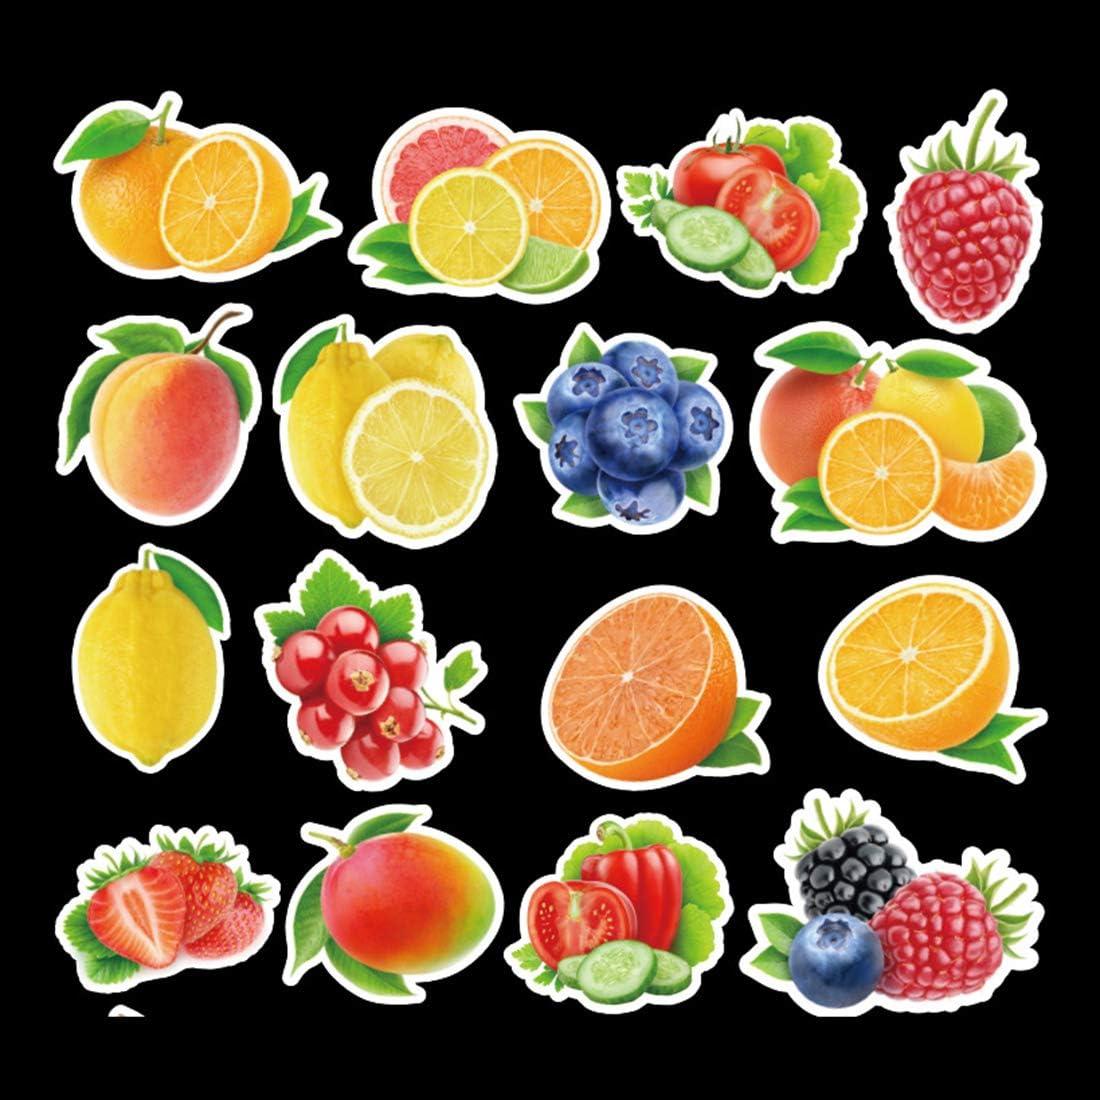 100Pcs Fruits Vegetables Waterproof Stickers for Water Bottle Cup Laptop Bike Skateboard Luggage Box Vinyl Graffiti Patches BRJKT